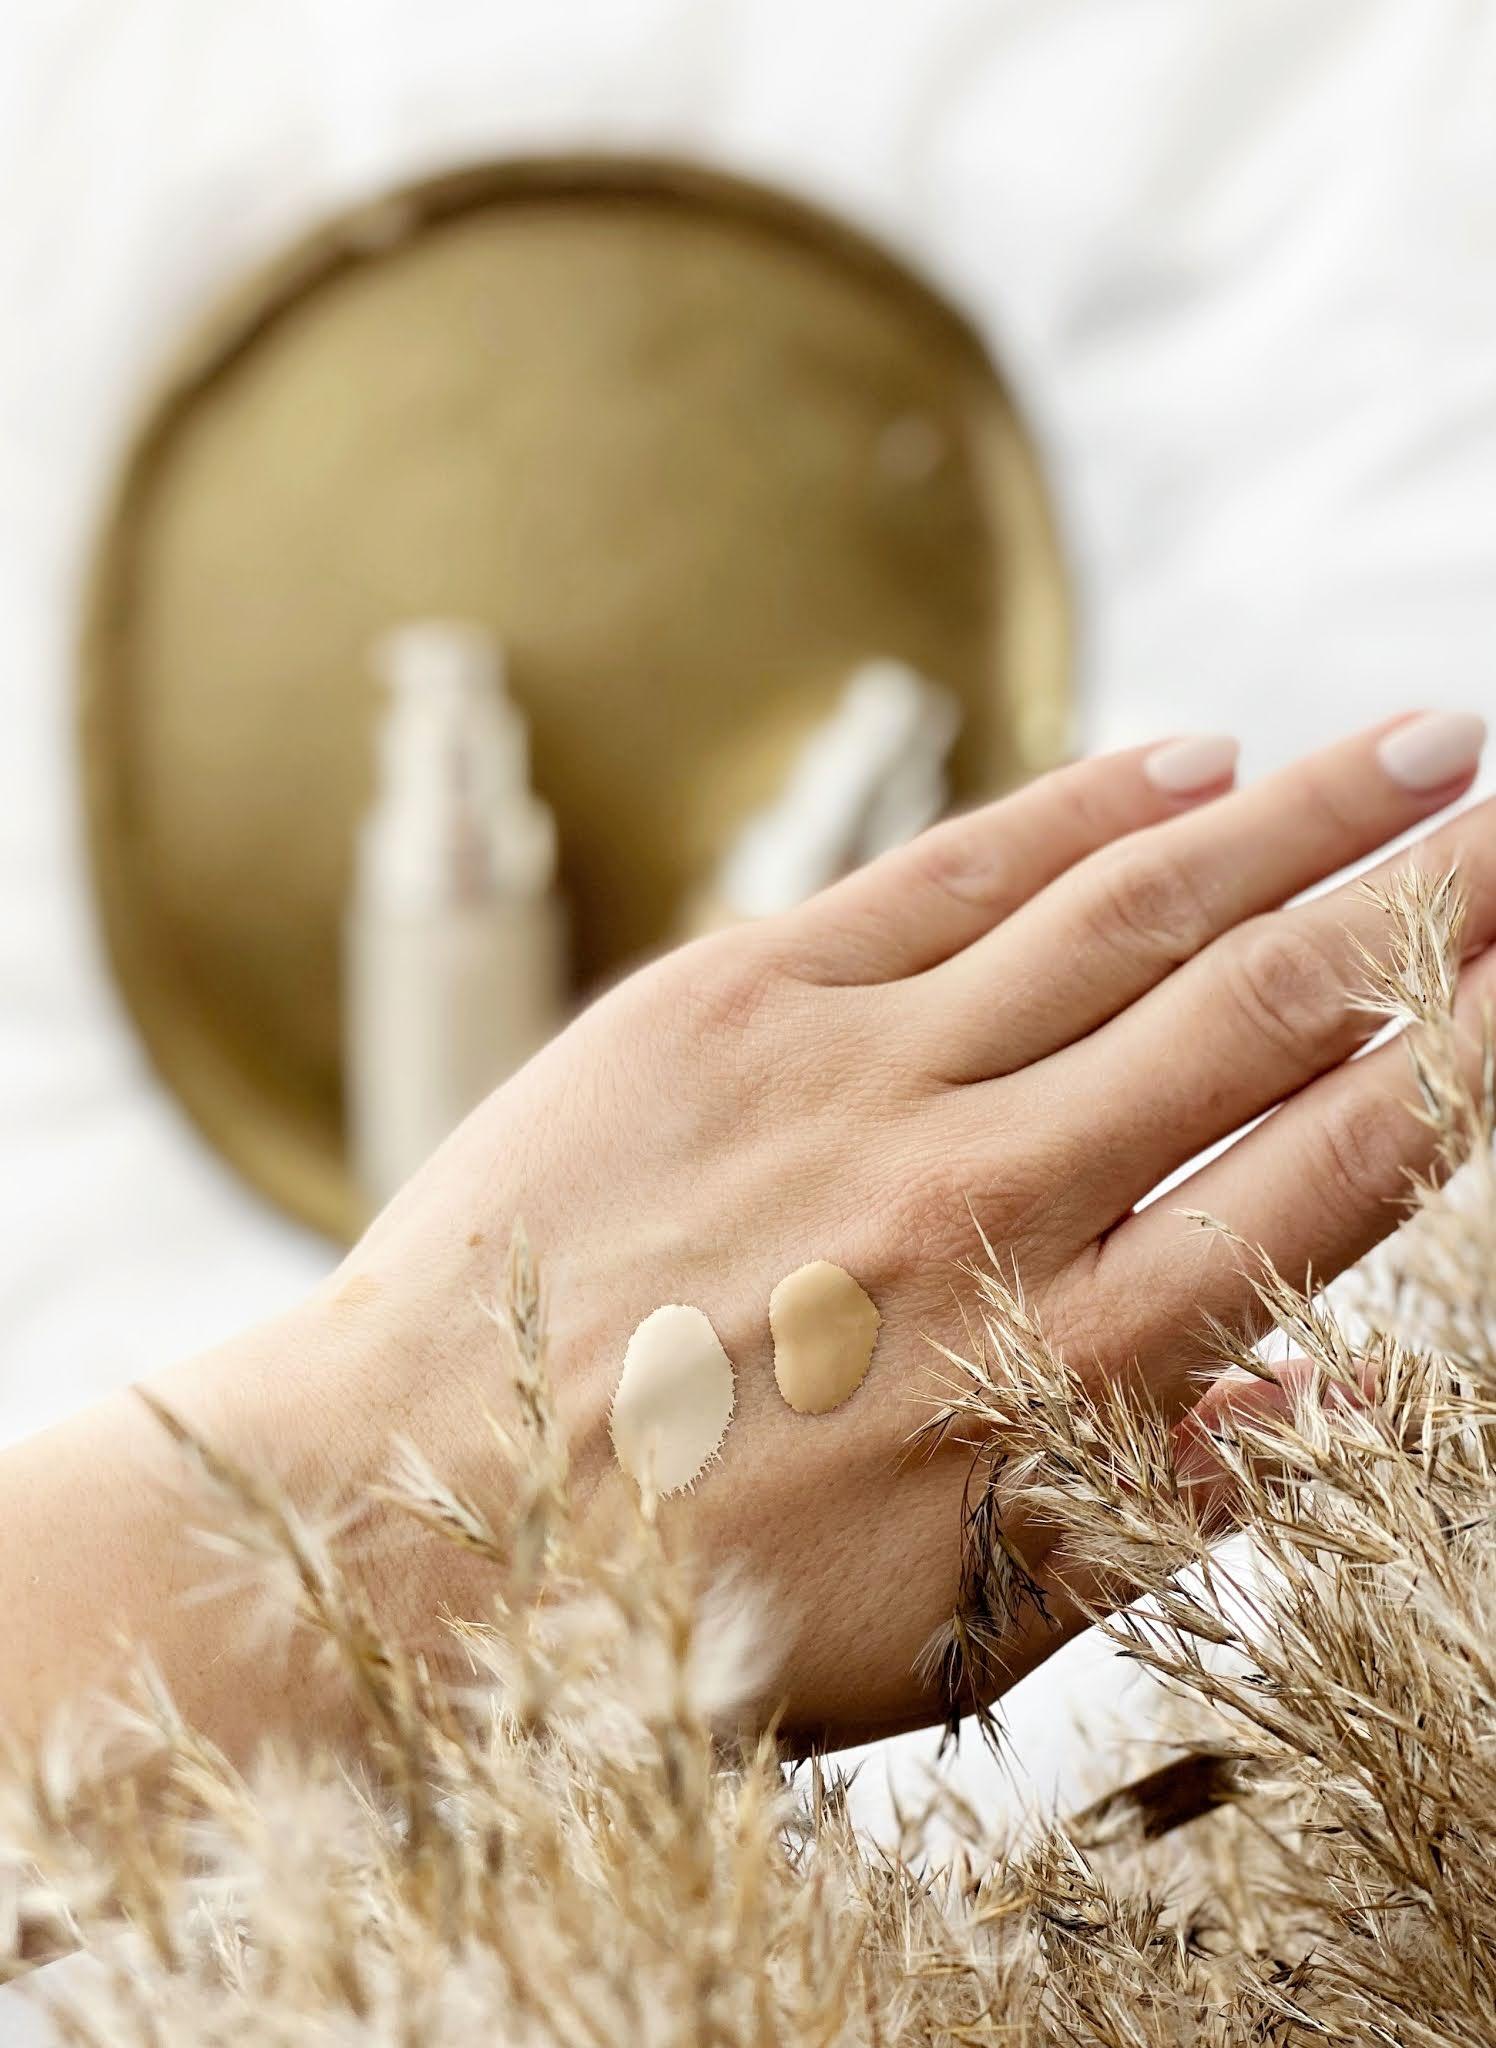 FLAWLESS-SKIN-Anti-aging-Foundation-Smooth-Firm-Skin-Dr-Irena-Eris-recenzja-i-swatches